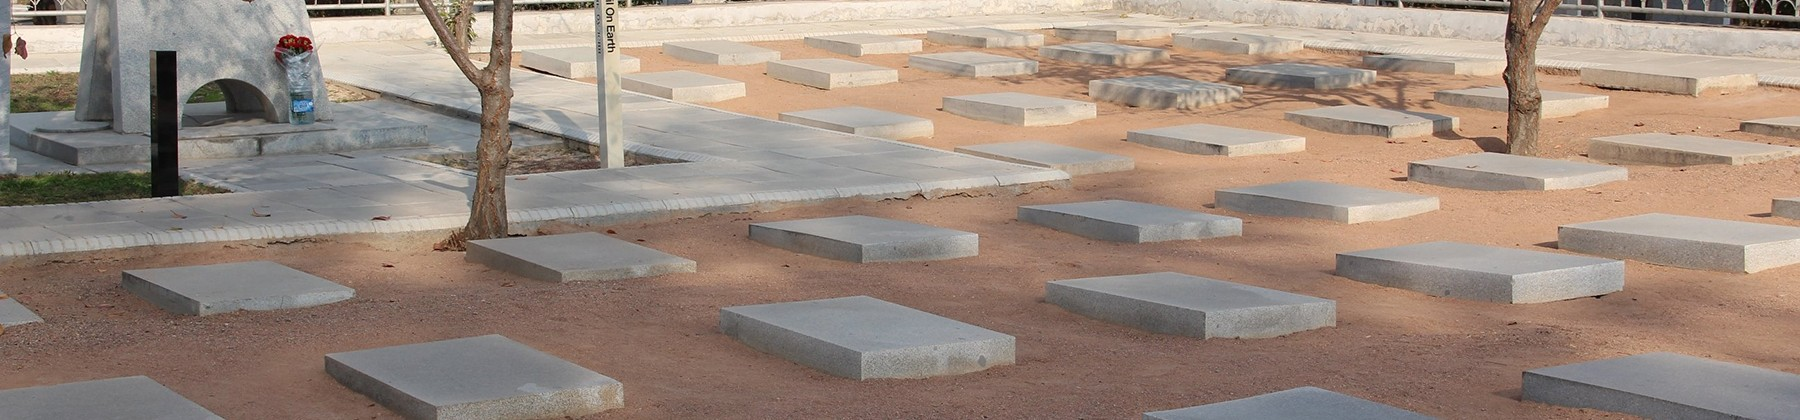 Japanese cemetery - 1